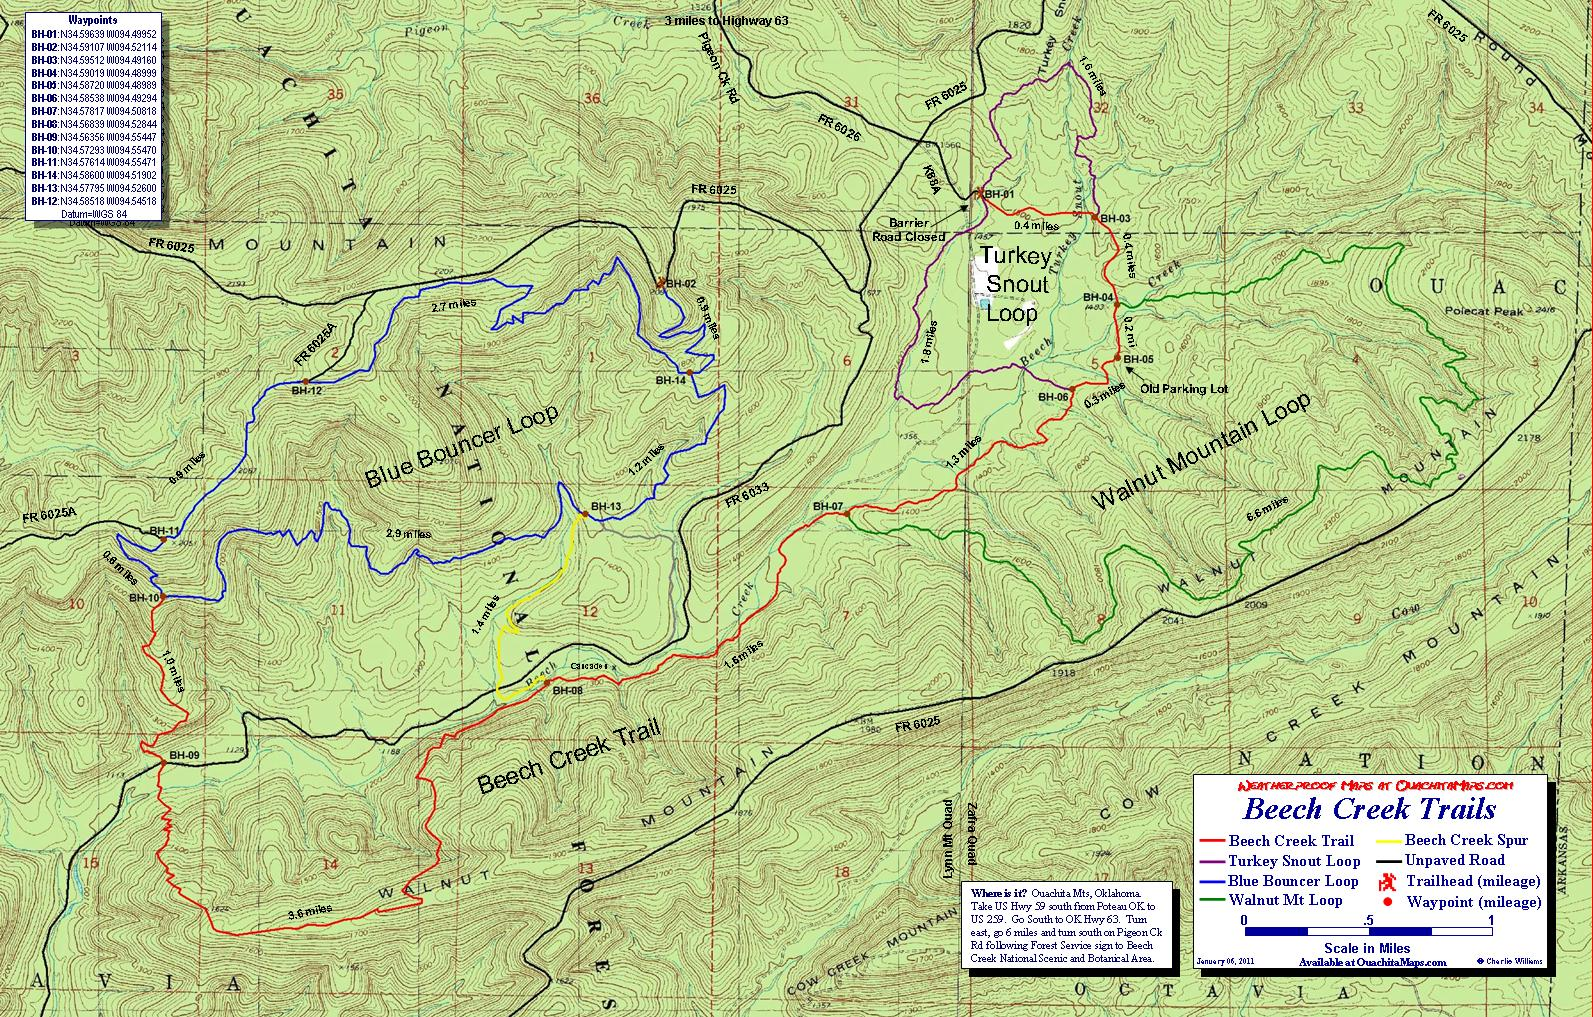 Falls Creek Oklahoma Map.Beech Creek Trails Map Ouachita Mts Oklahoma